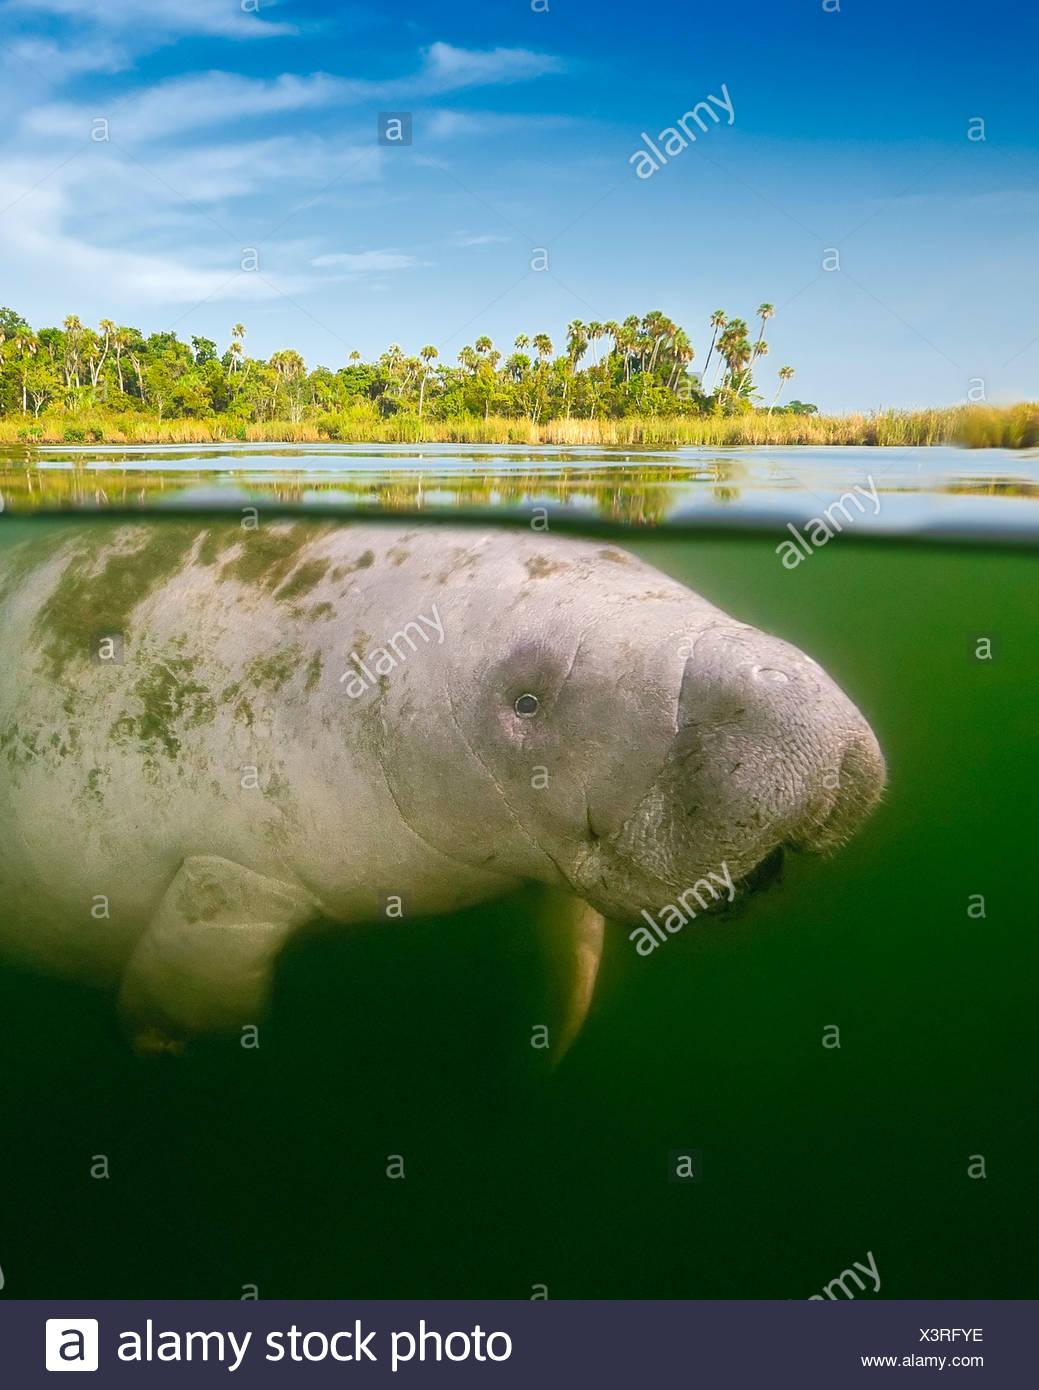 Over/under of Florida manatee calf - Stock Image